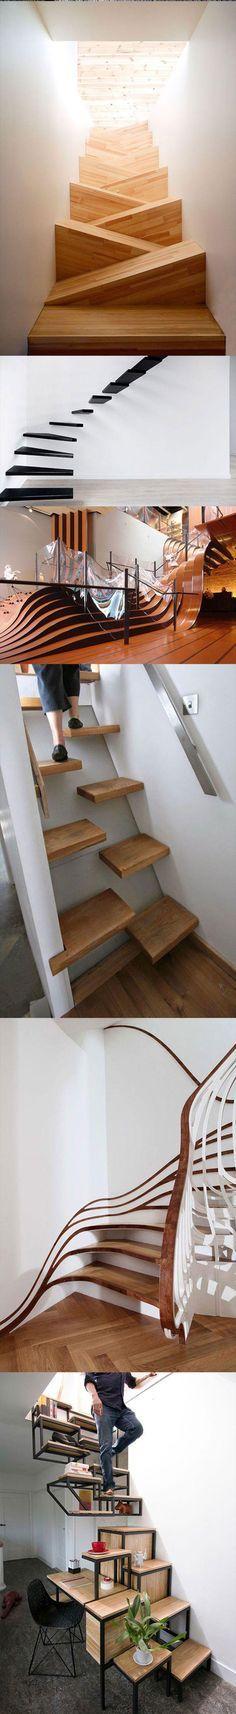 Amazing Stairs Designs